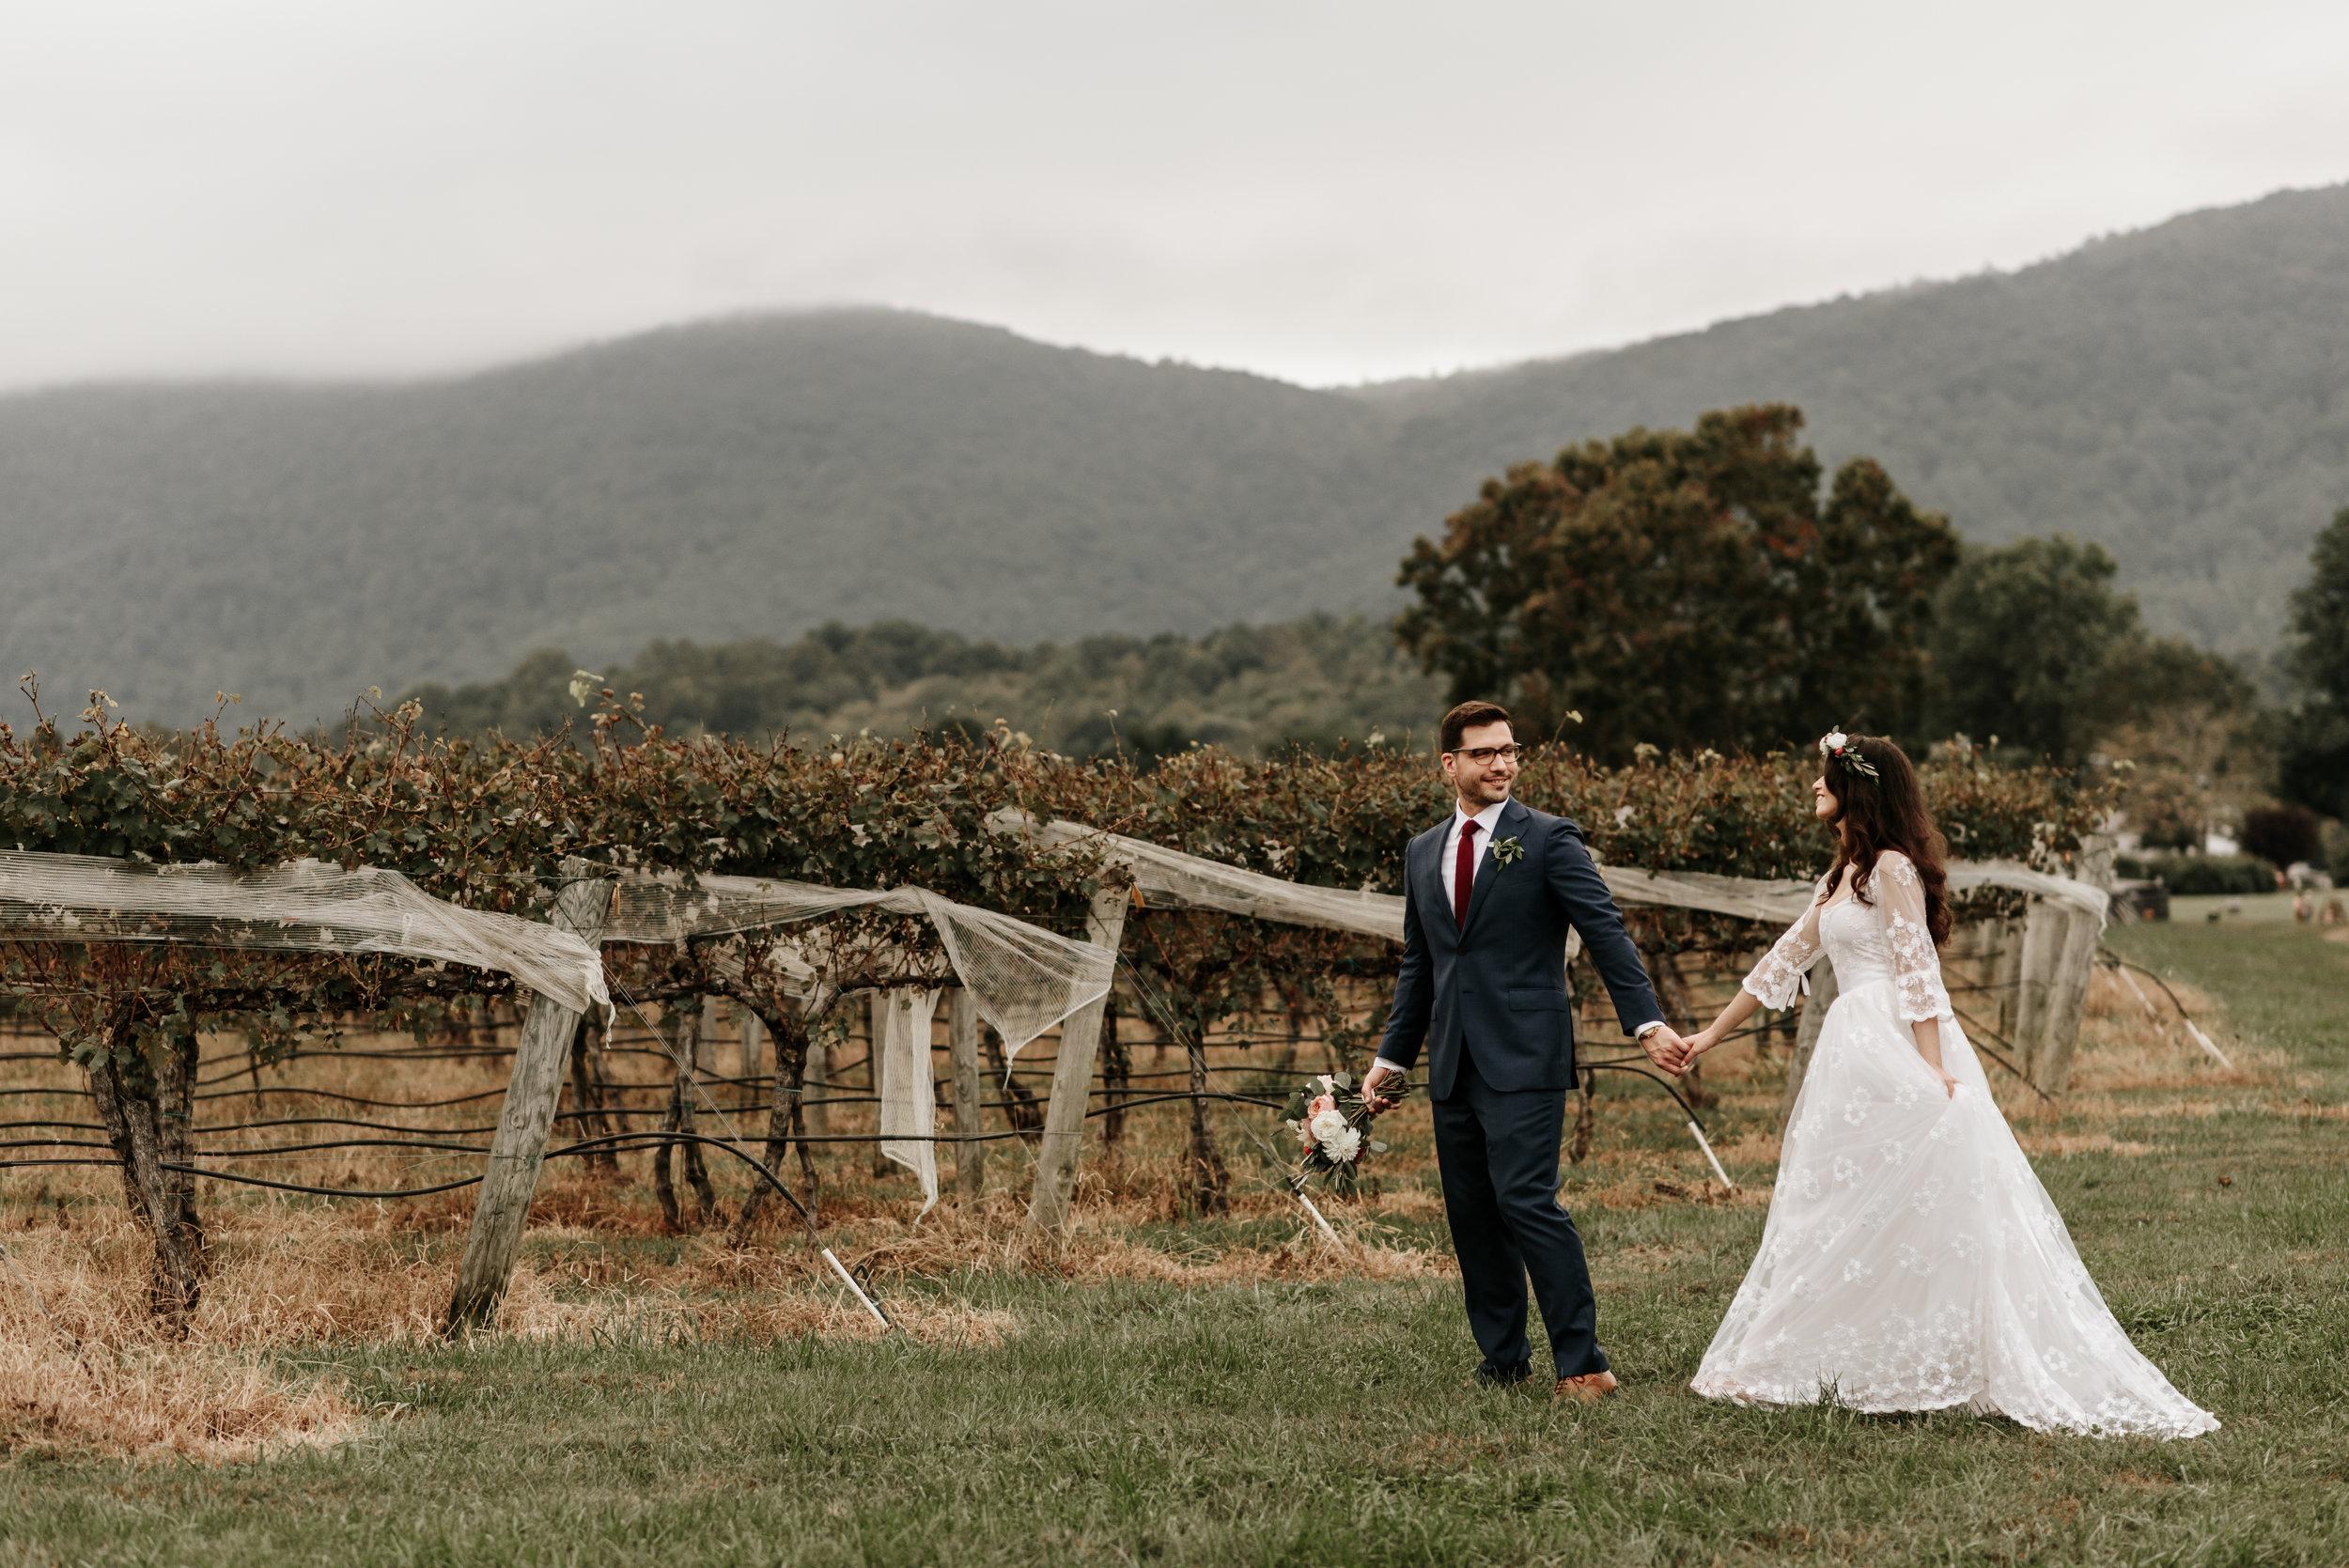 Veritas-Vineyards-and-Winery-Wedding-Photography-Afton-Virginia-Yasmin-Seth-Photography-by-V-2687.jpg